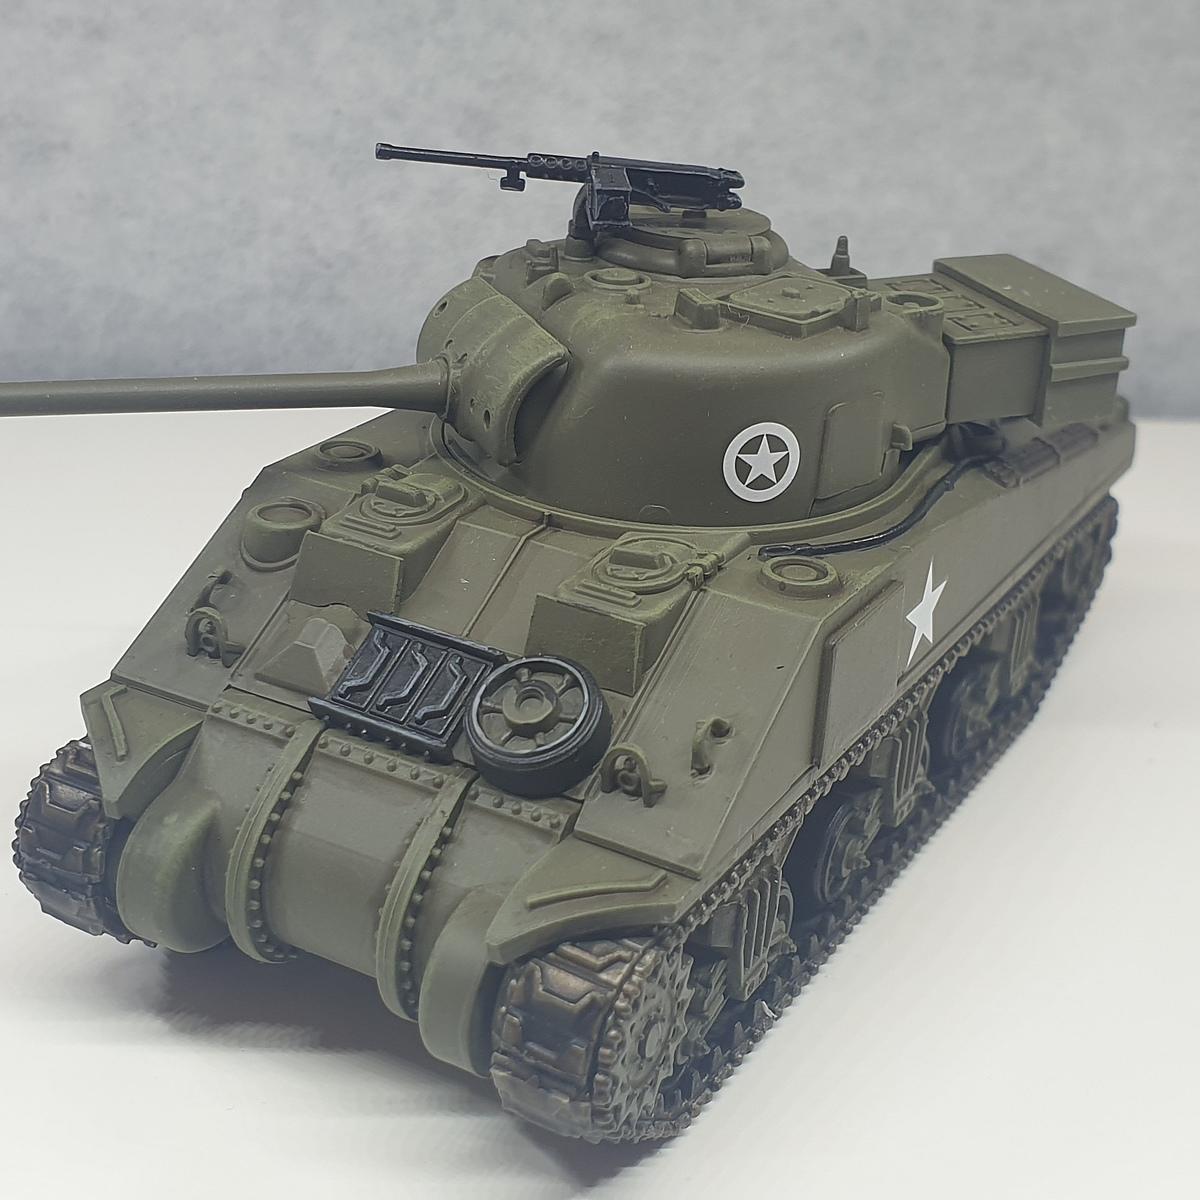 WWII Sherman